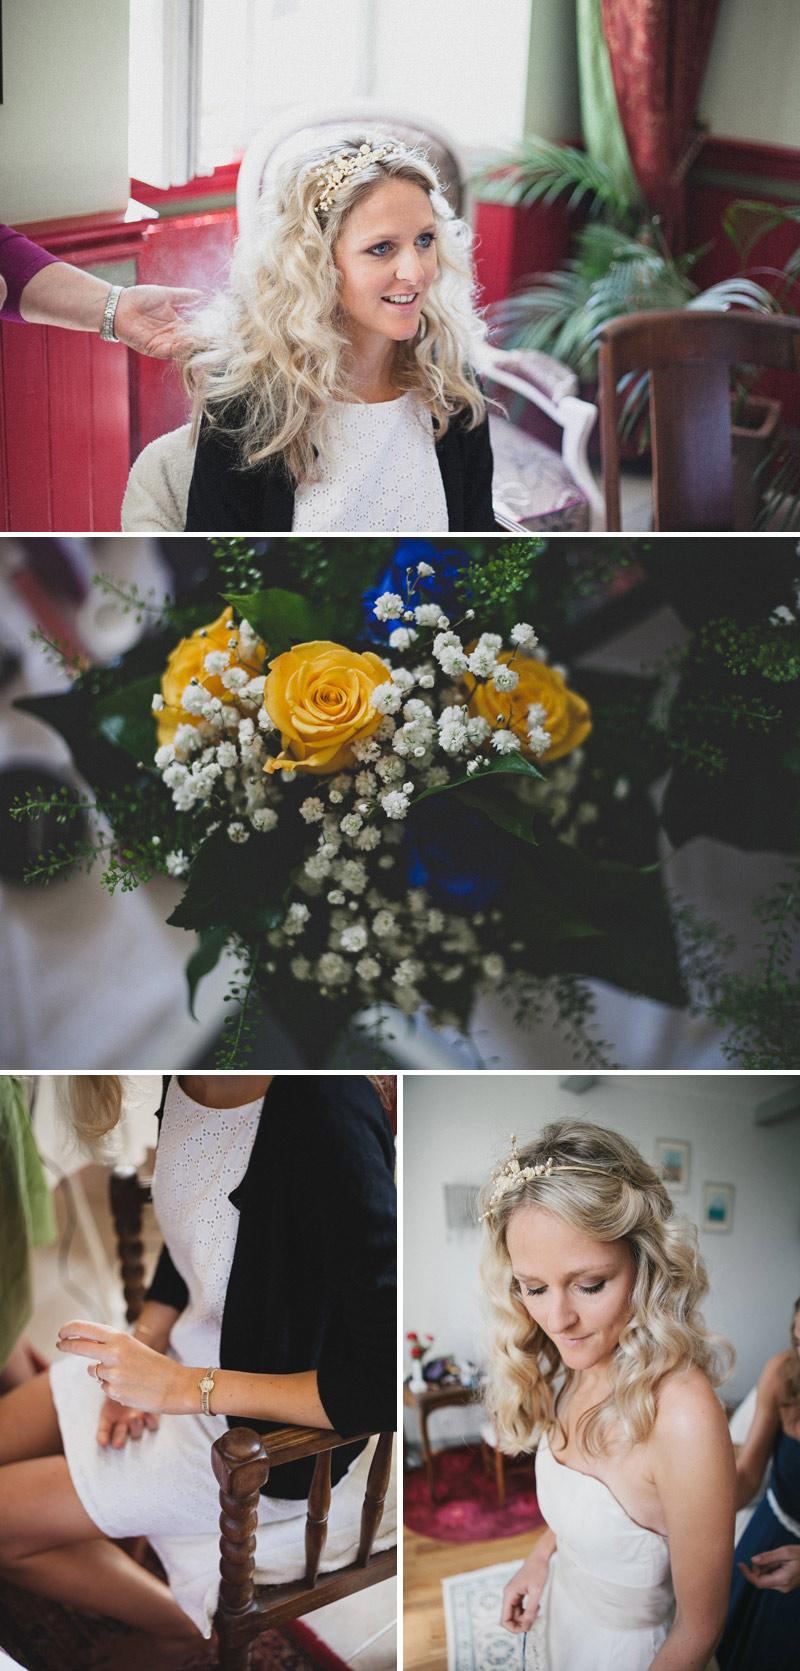 Timeless Couture Bespoke Wedding Dress